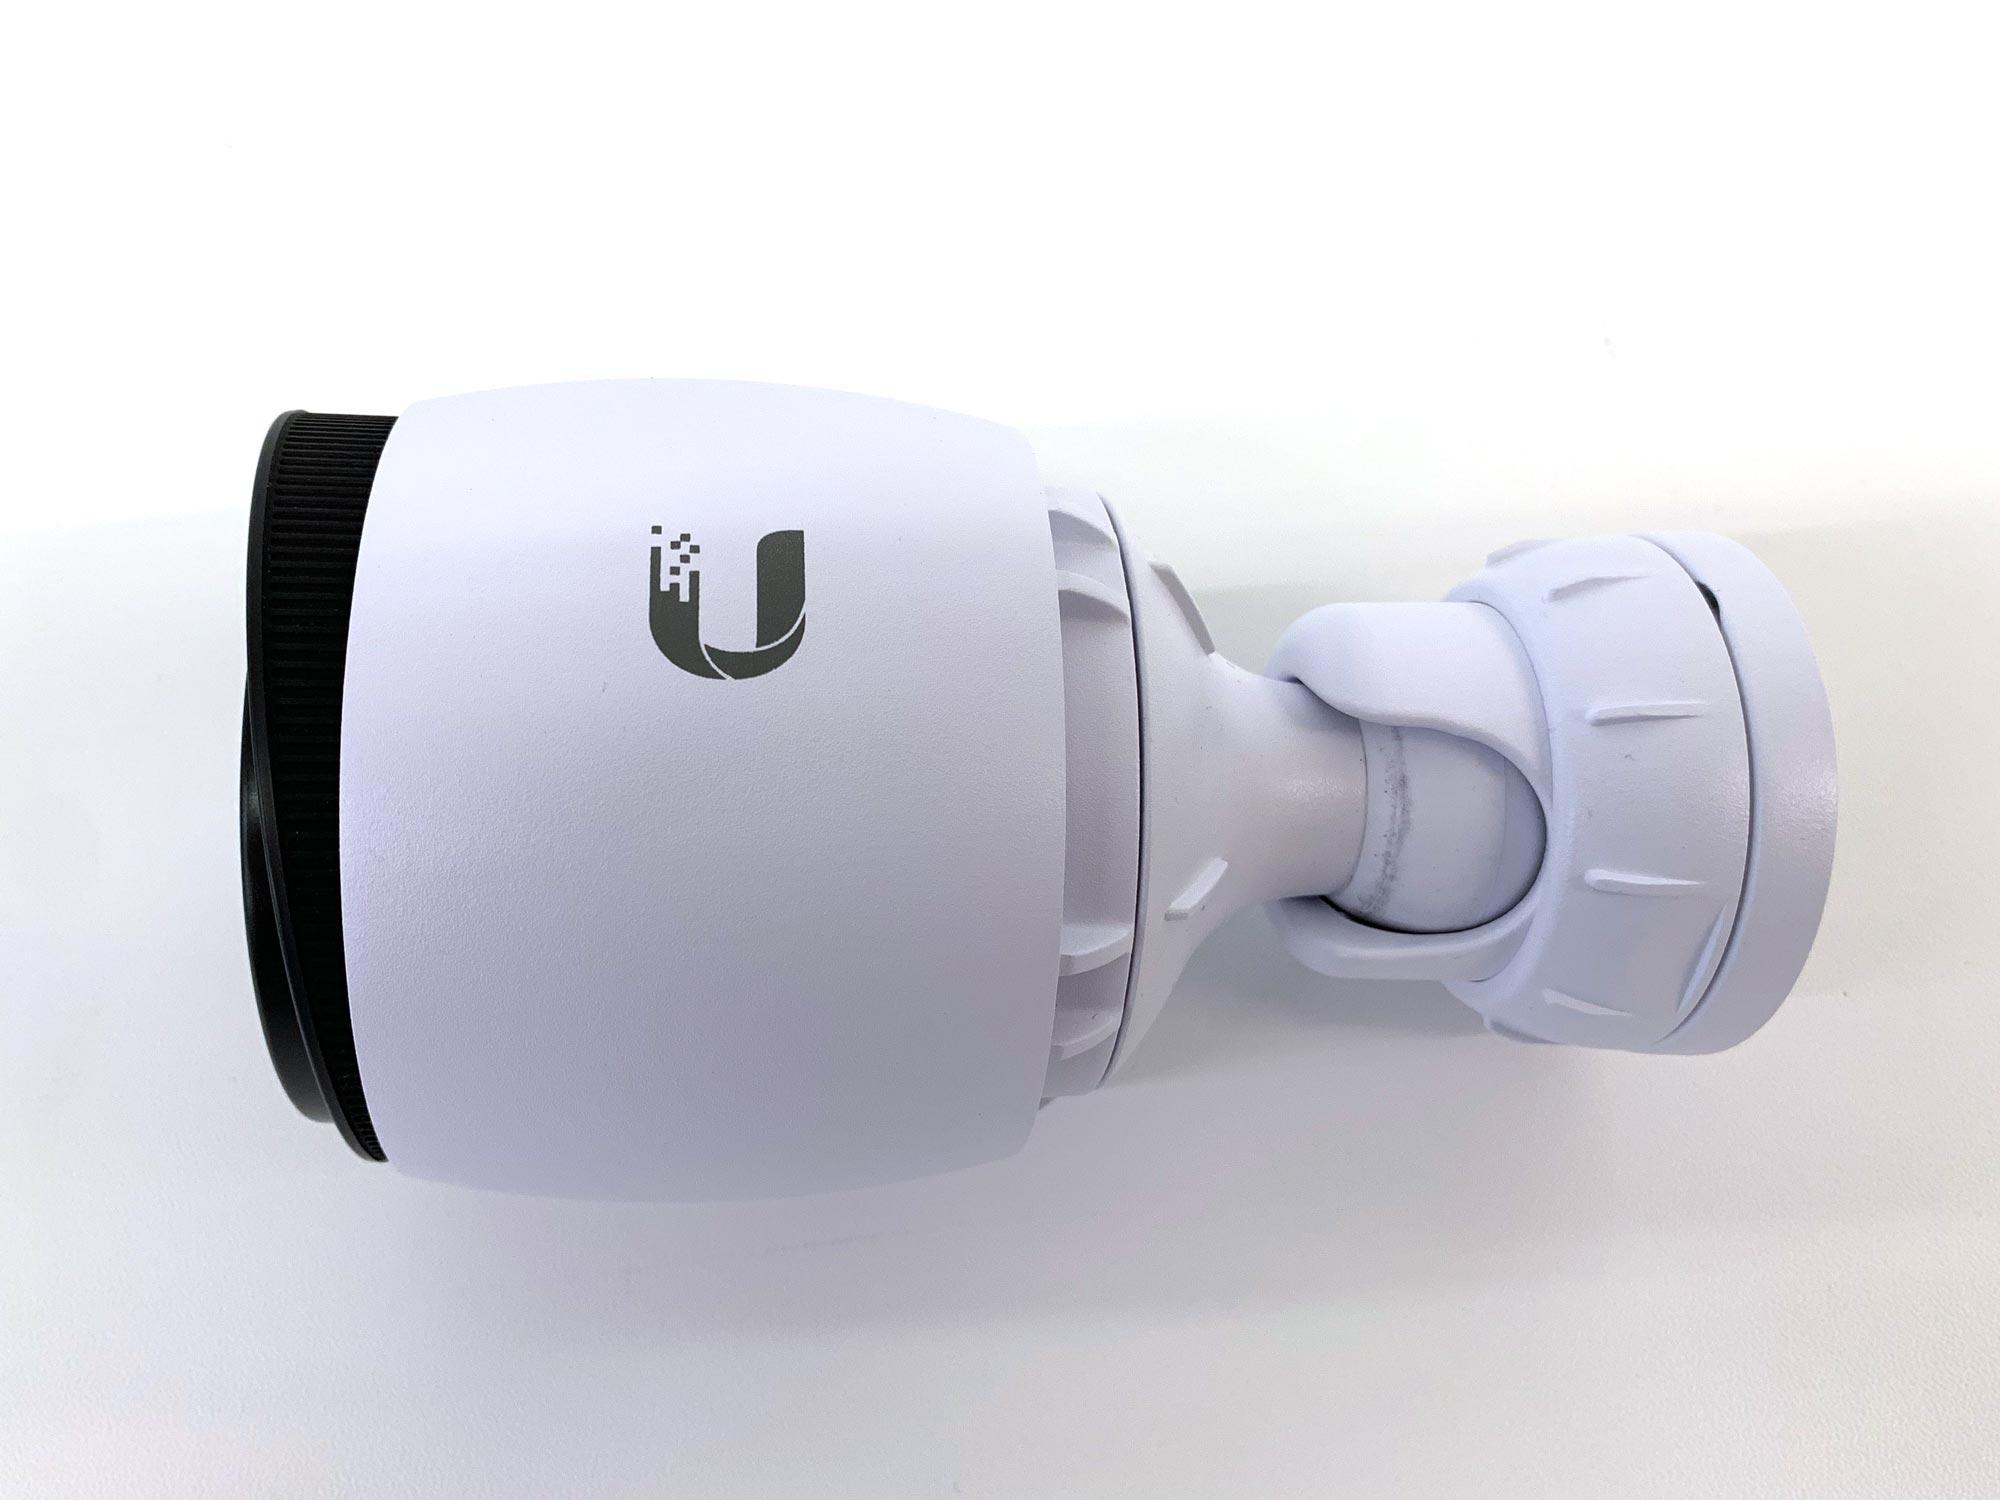 UVC-G3-PRO - UniFi Protect G3 PRO Camera